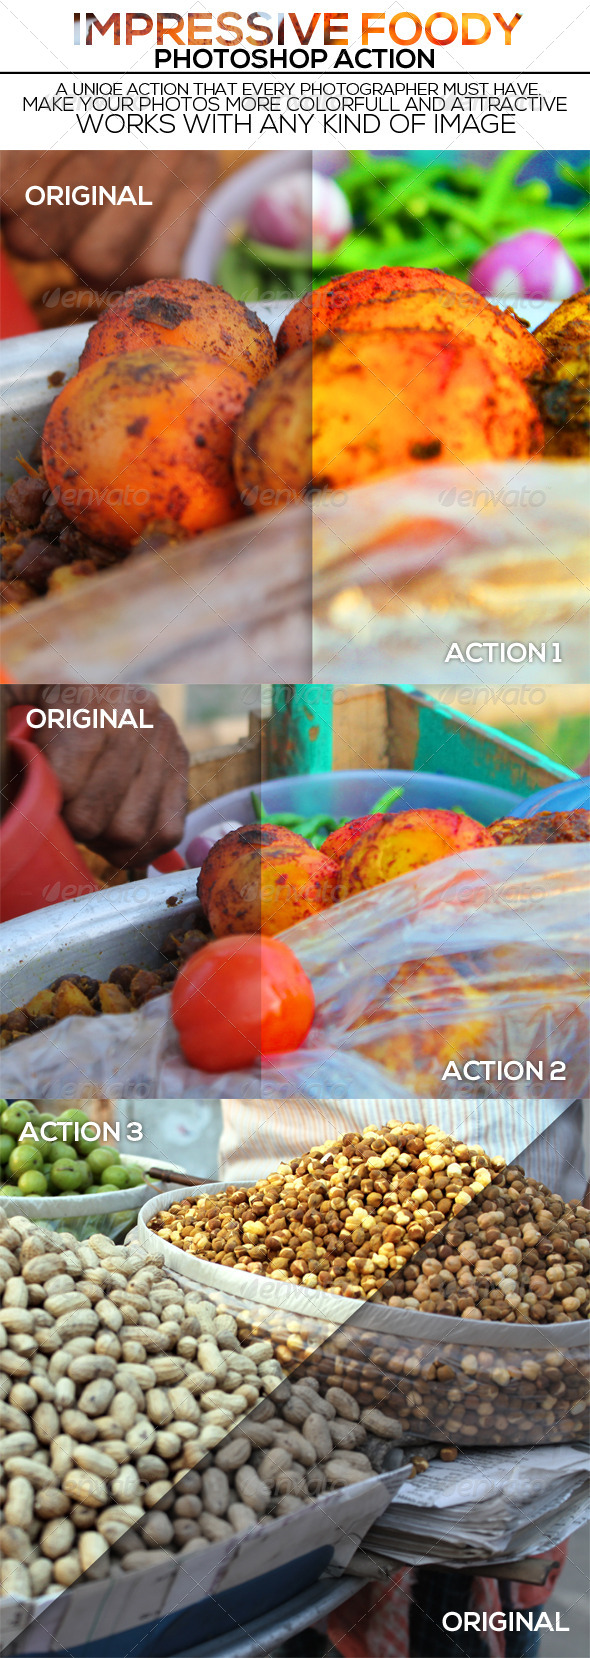 GraphicRiver Impressive Foody Photoshop Action 7003753